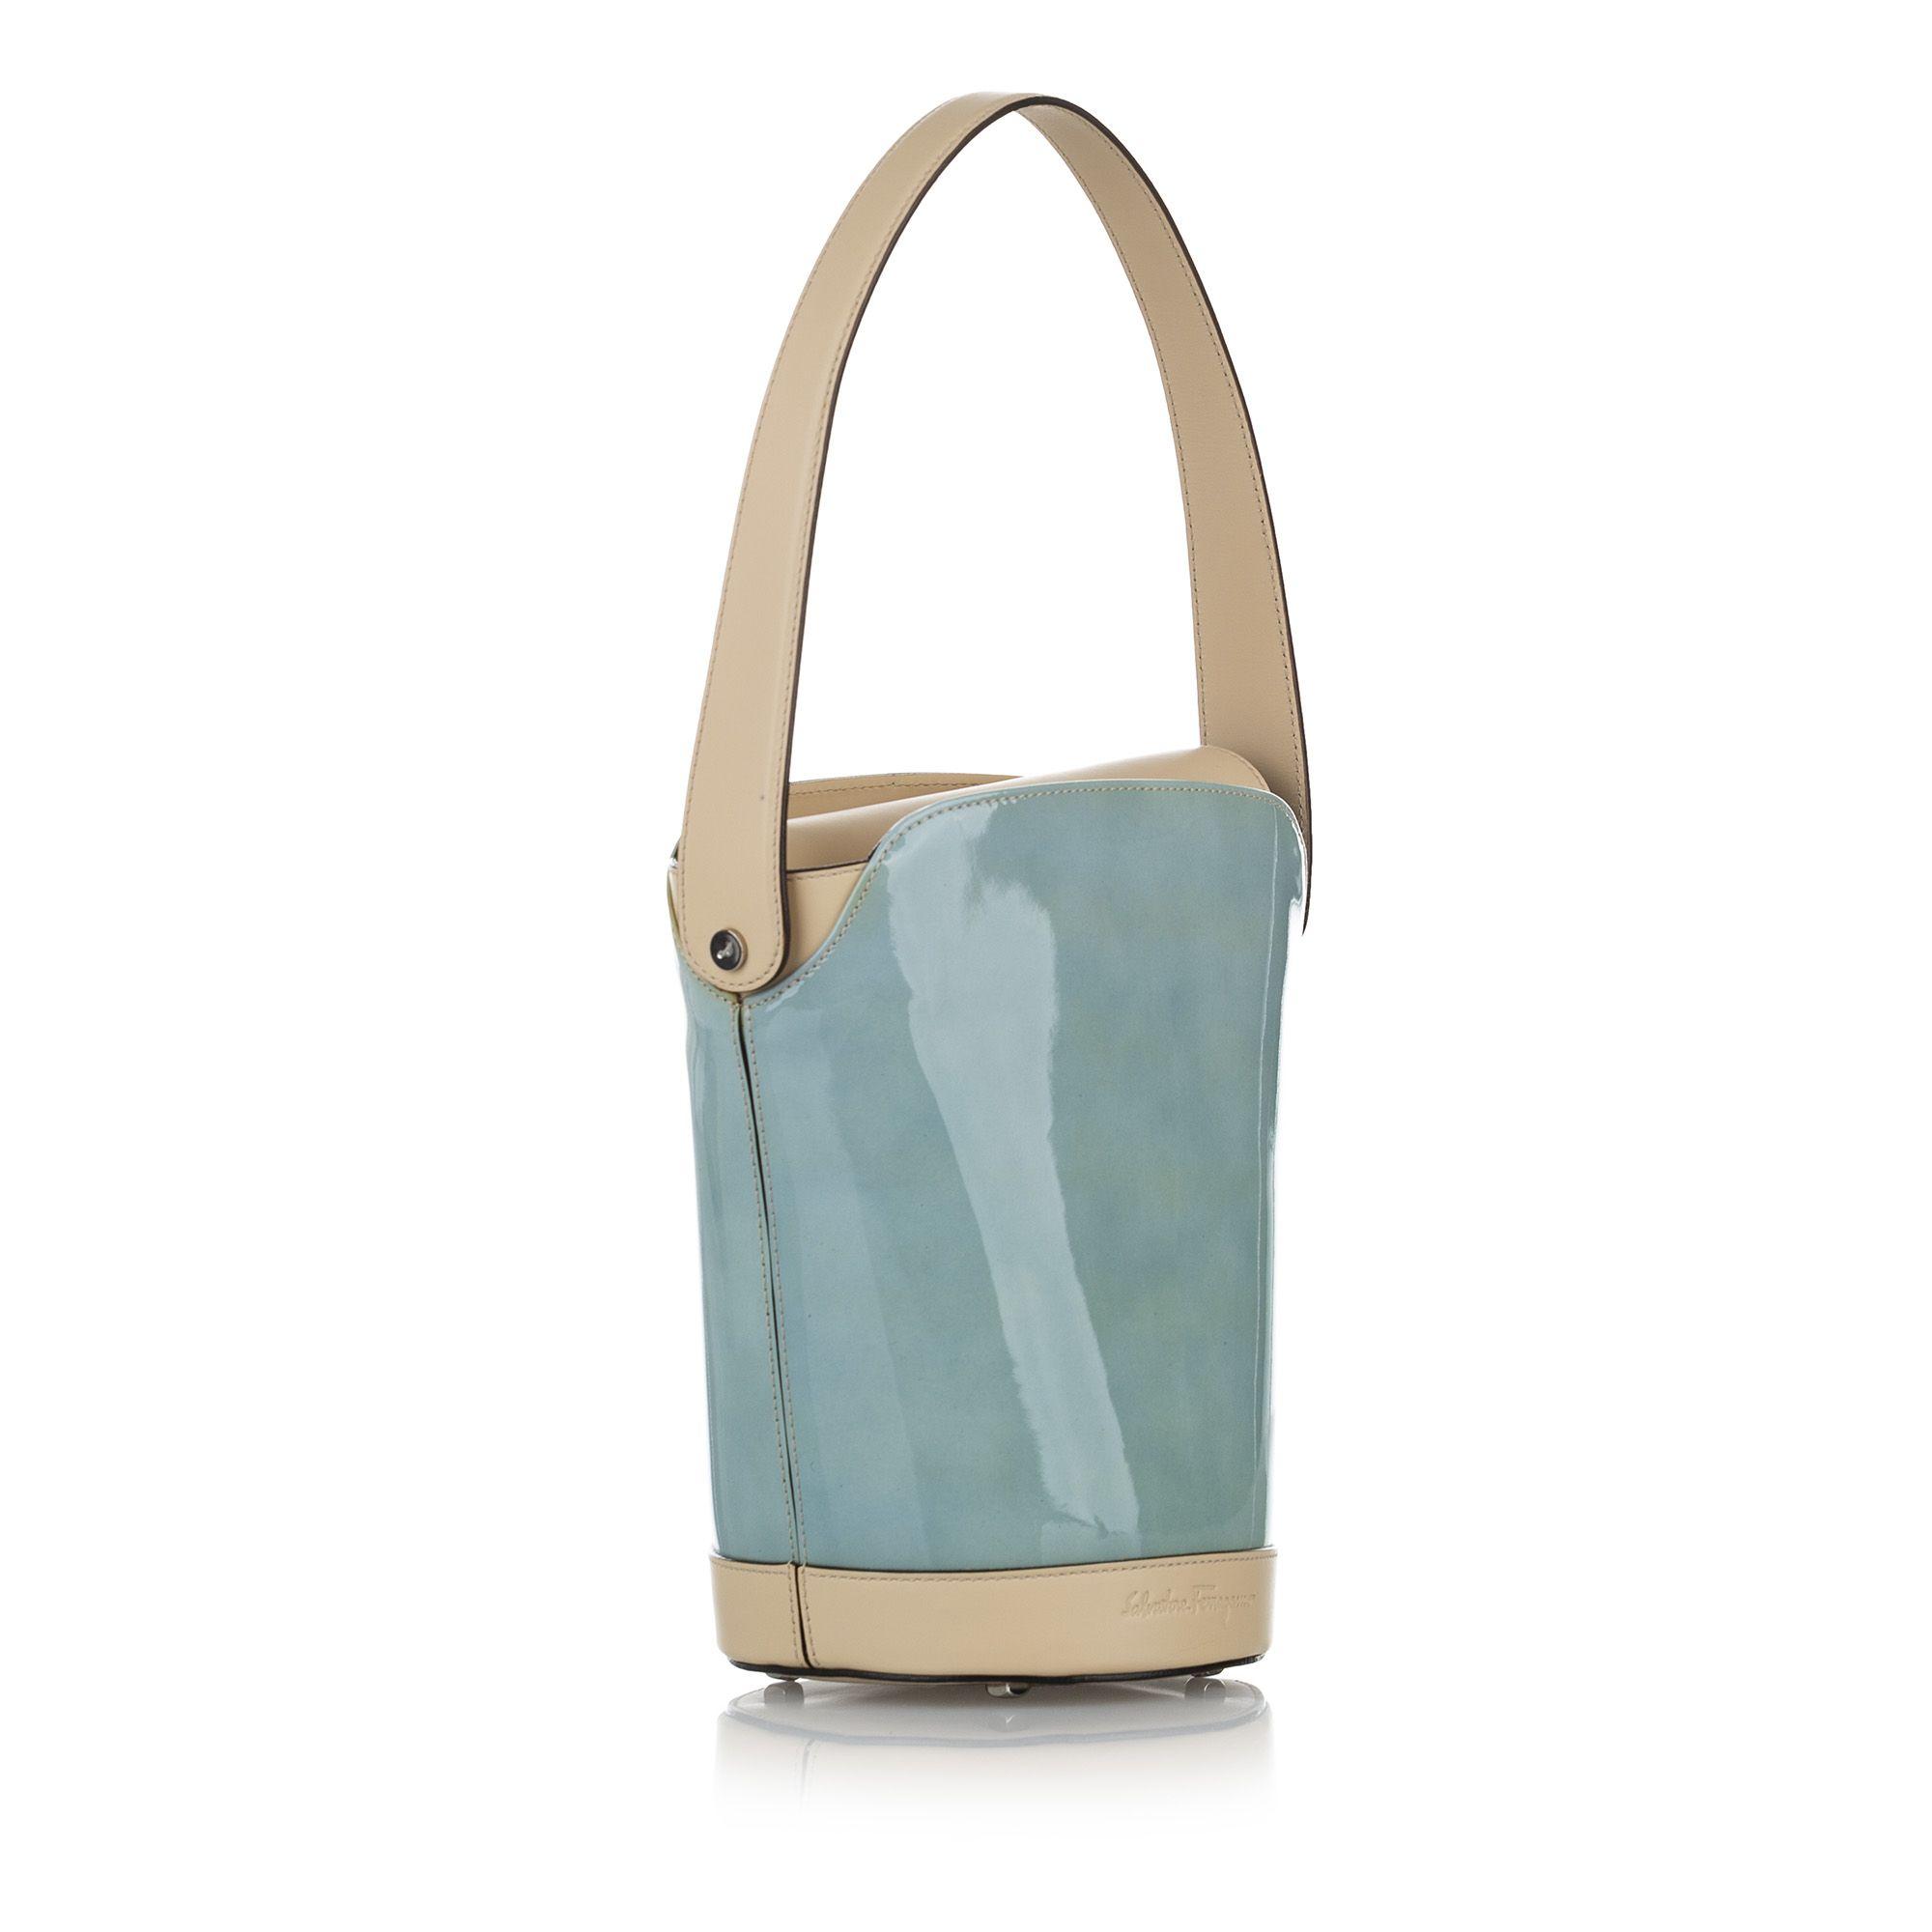 Vintage Ferragamo Patent Leather Bucket Bag Blue